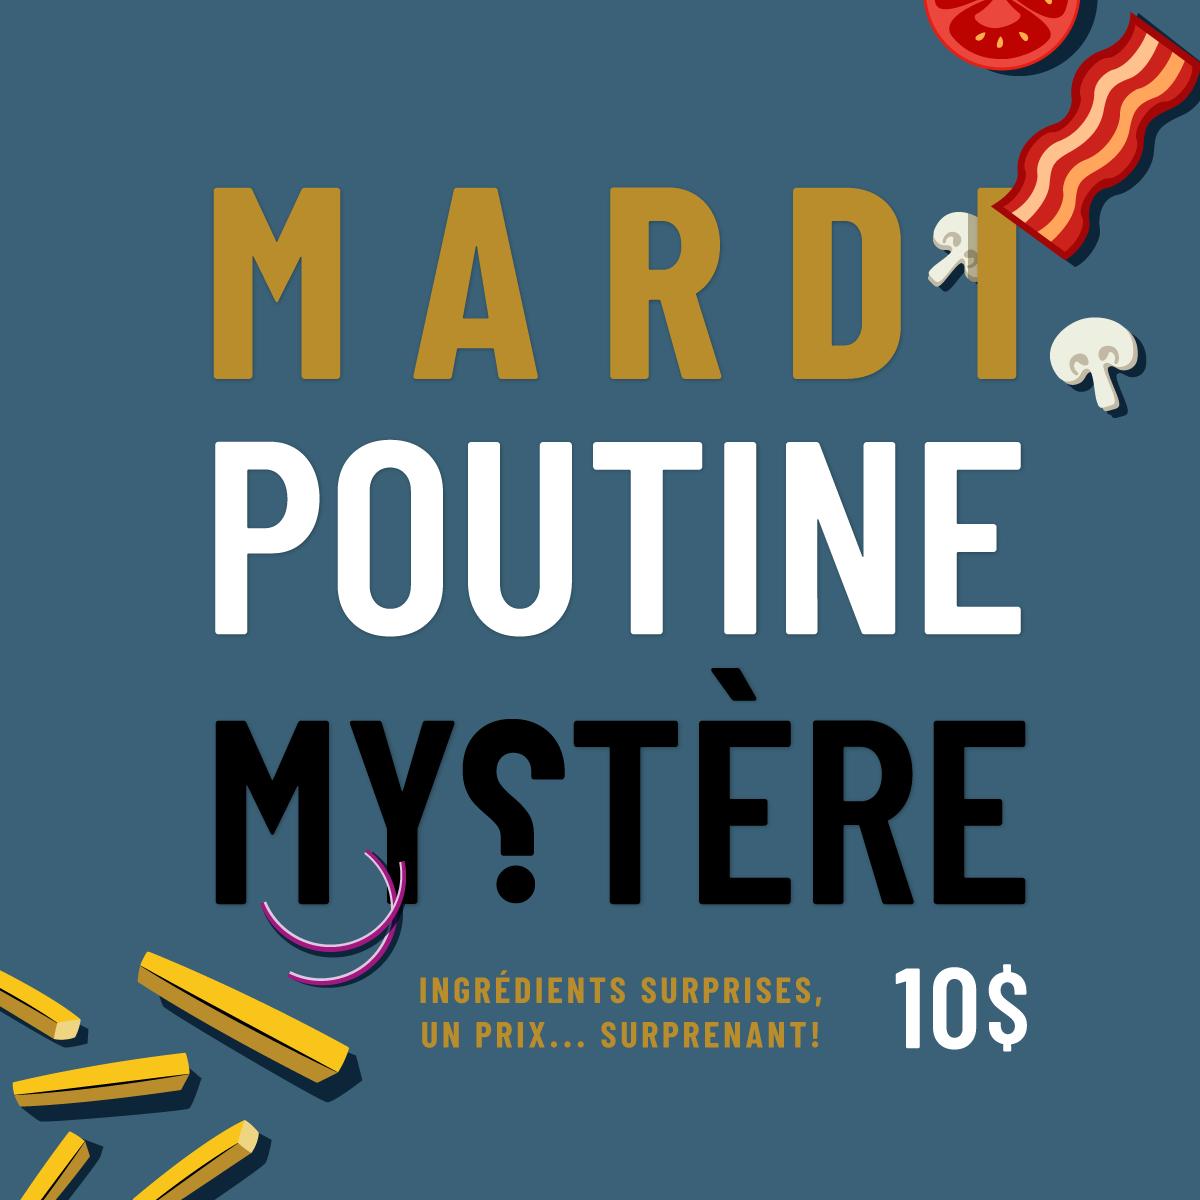 Mardi poutine mystère | La Souche Microbrasserie-Restaurant